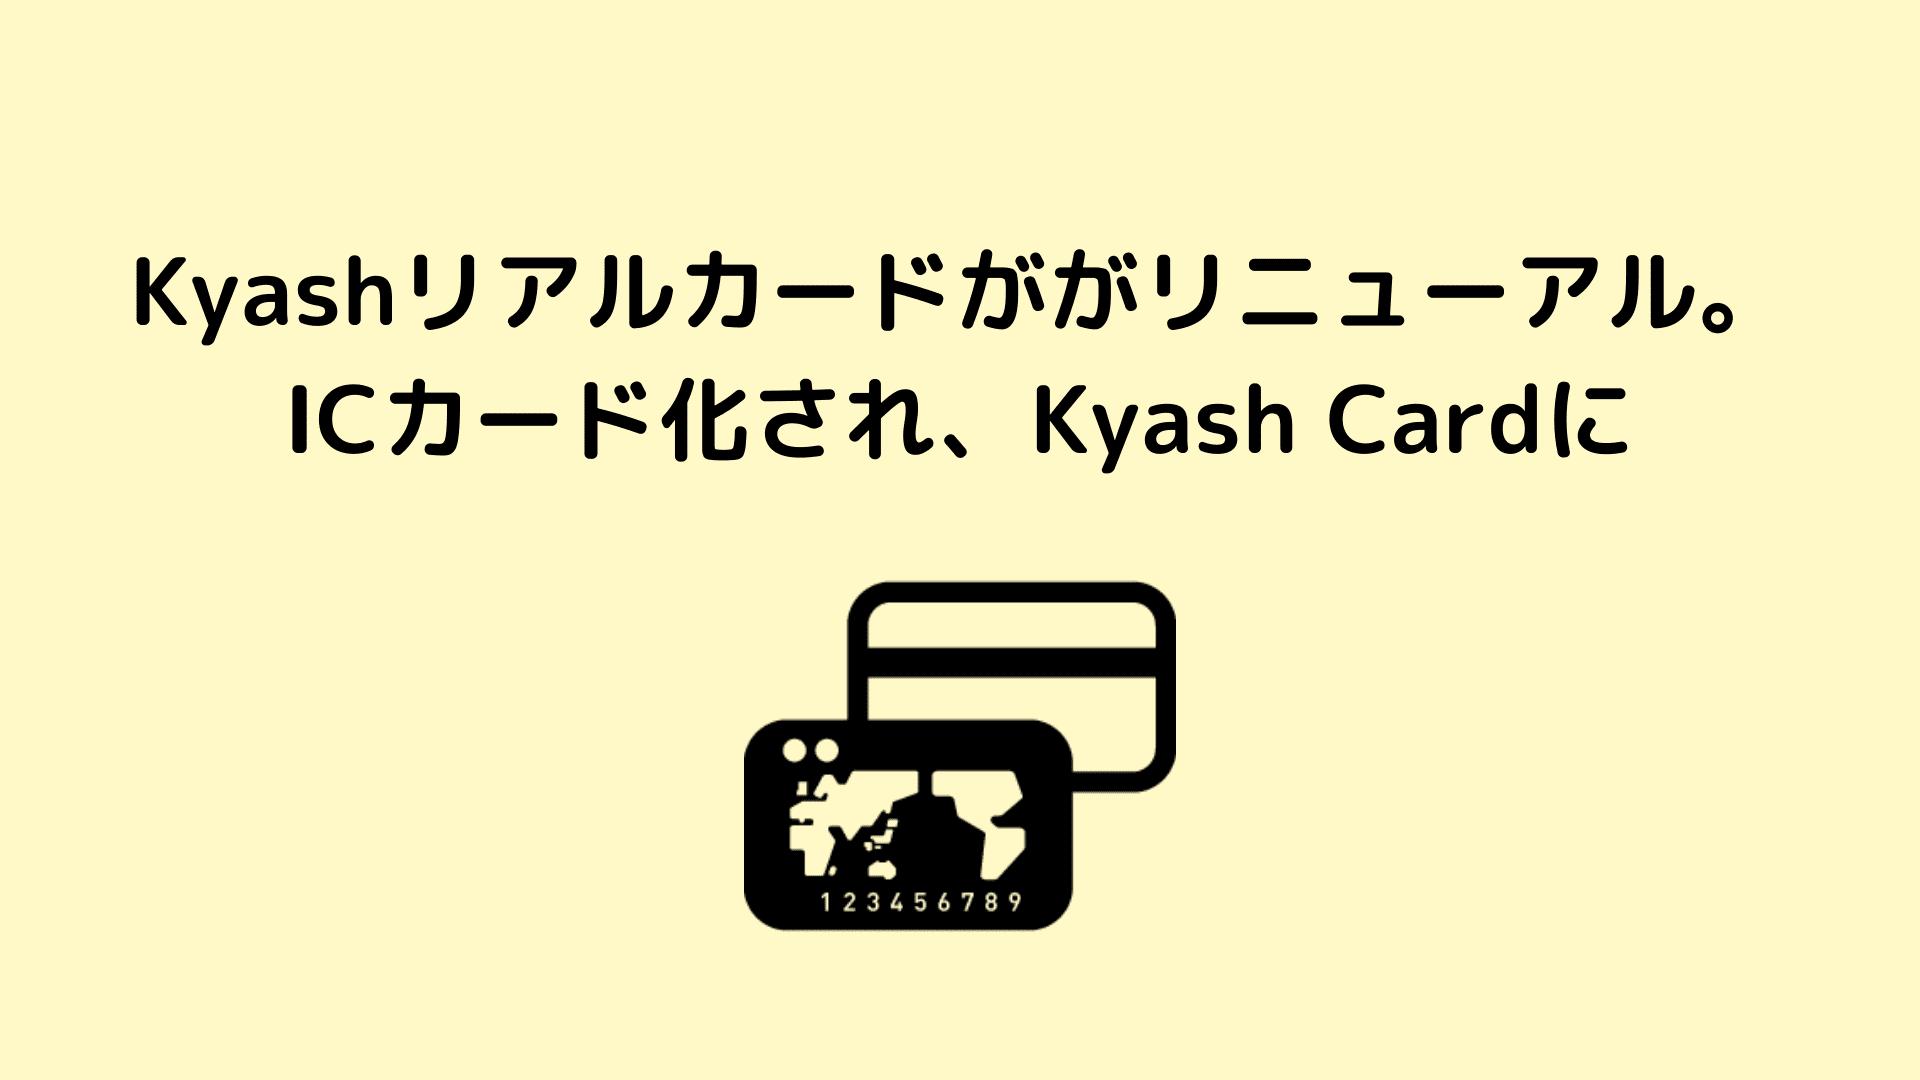 Kyashカードがリニューアル